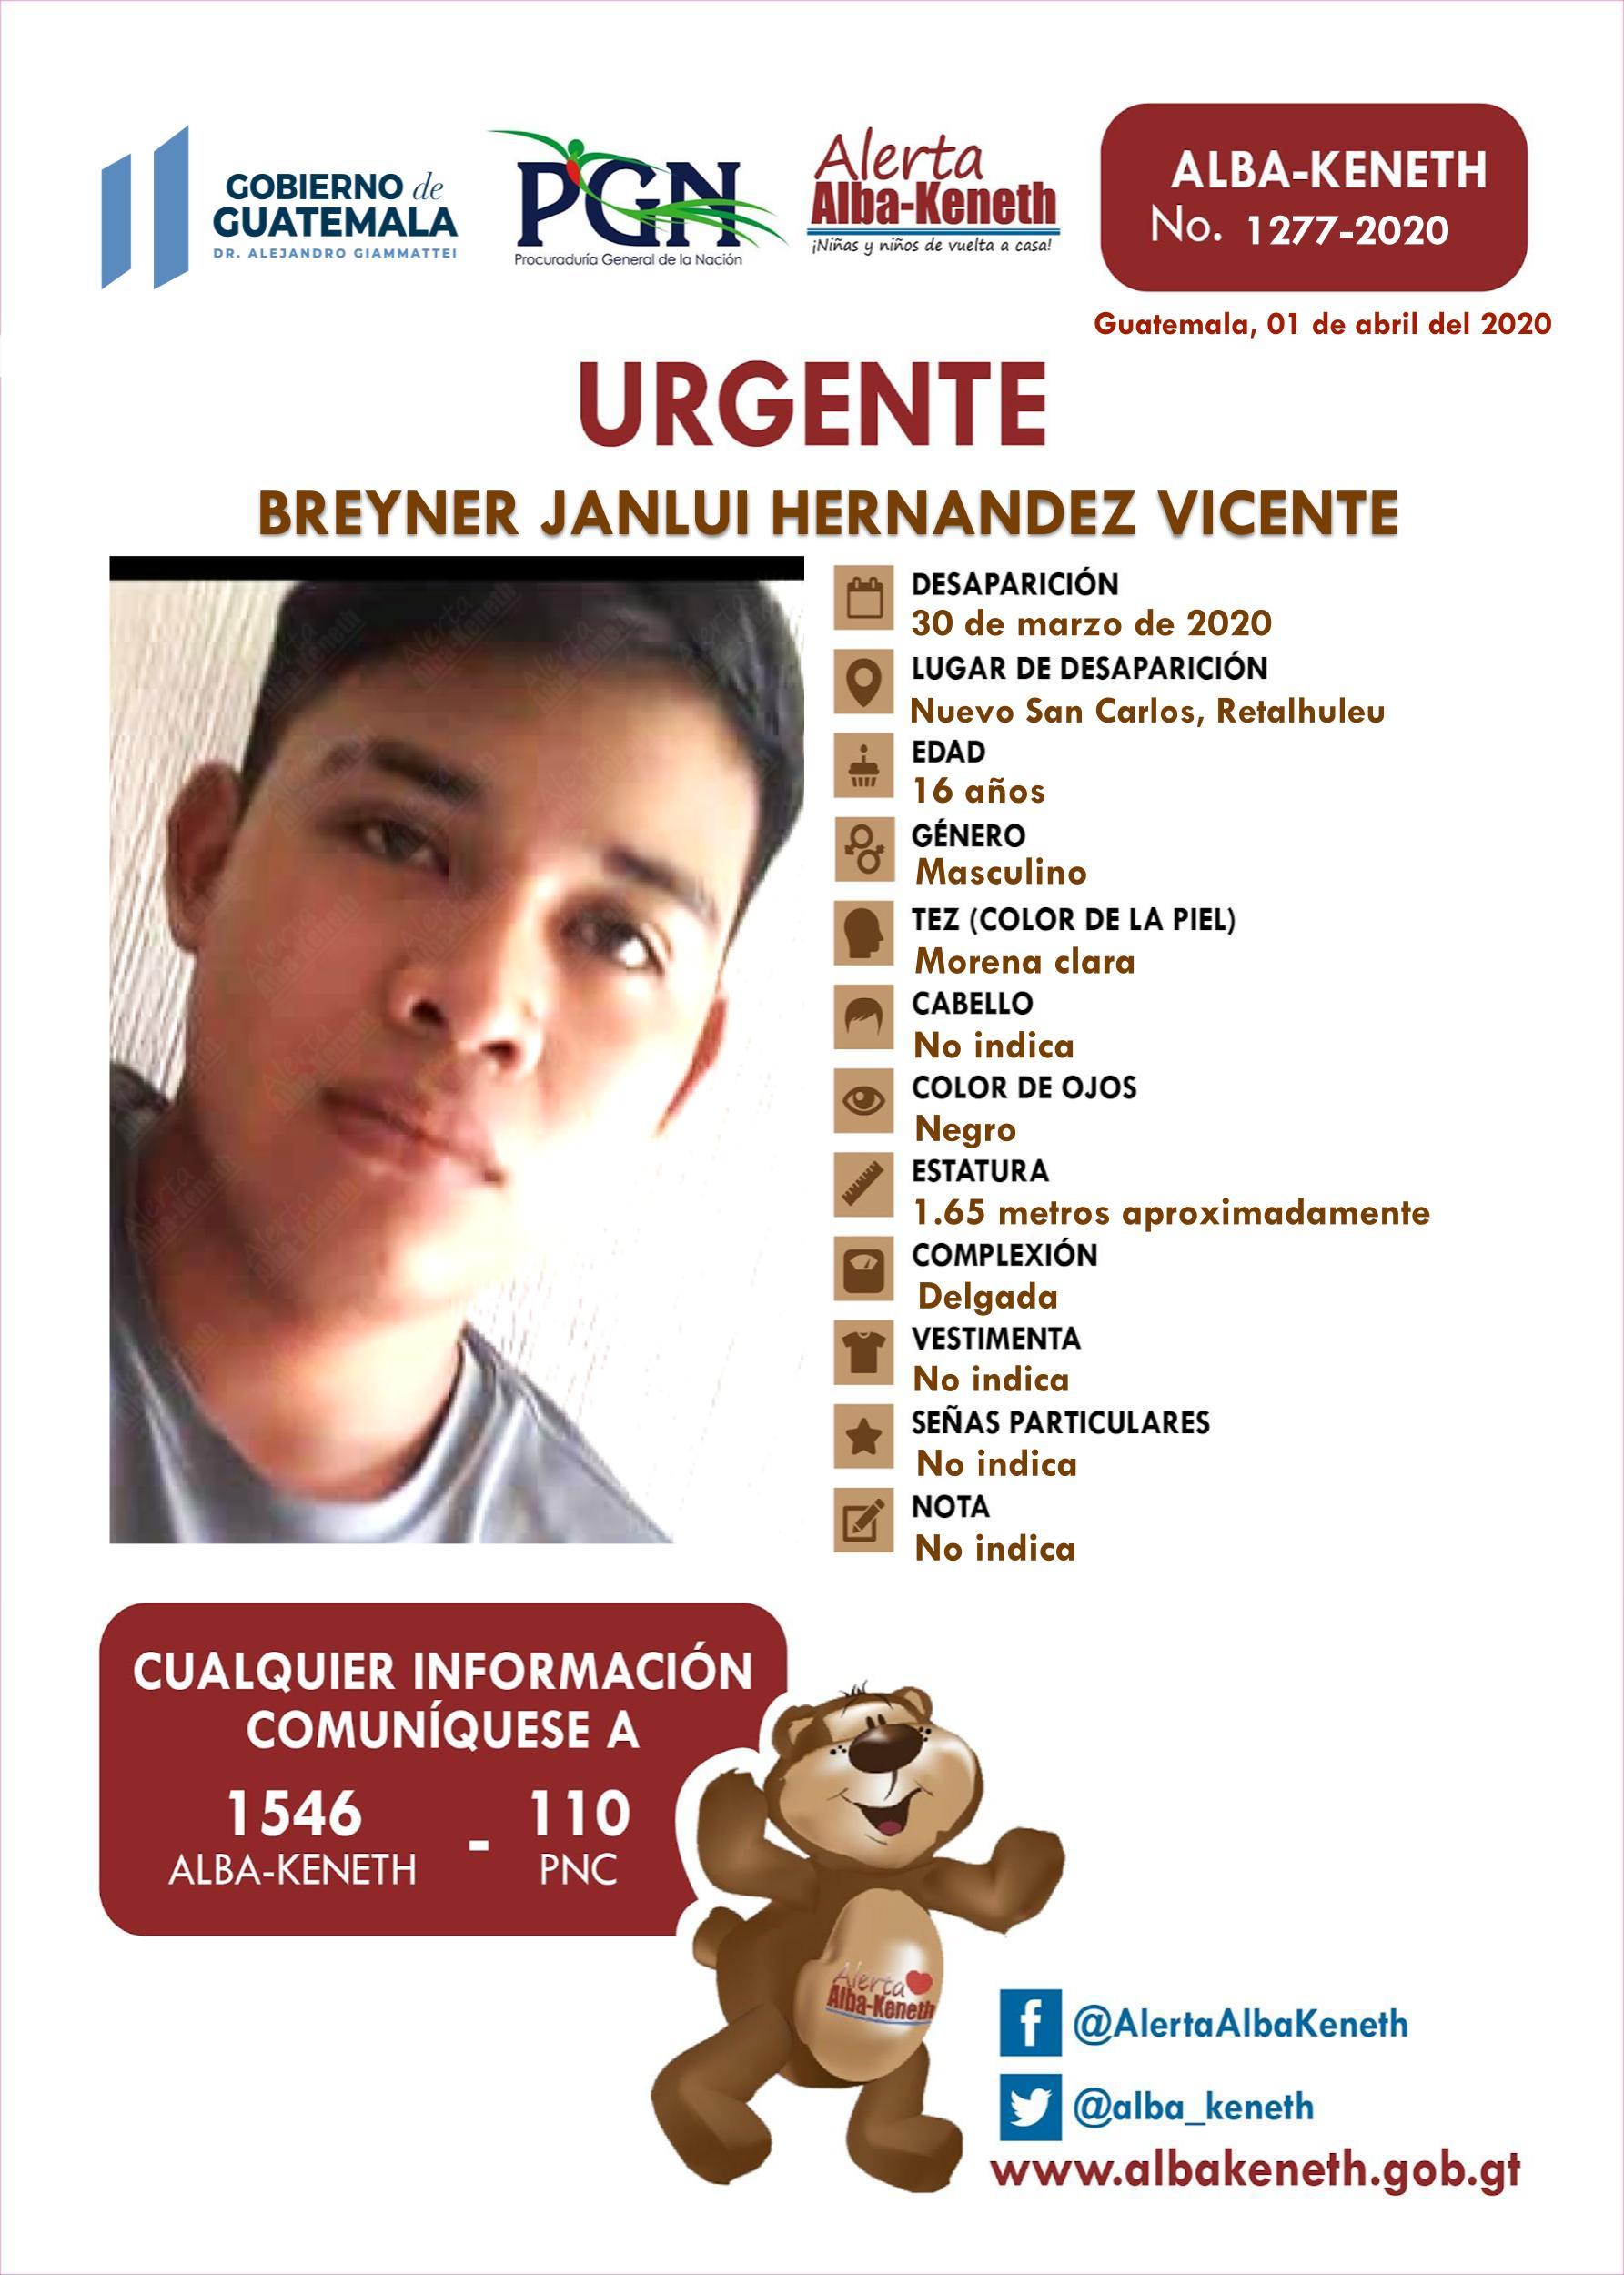 Breyner Janlui Hernandez Vicente